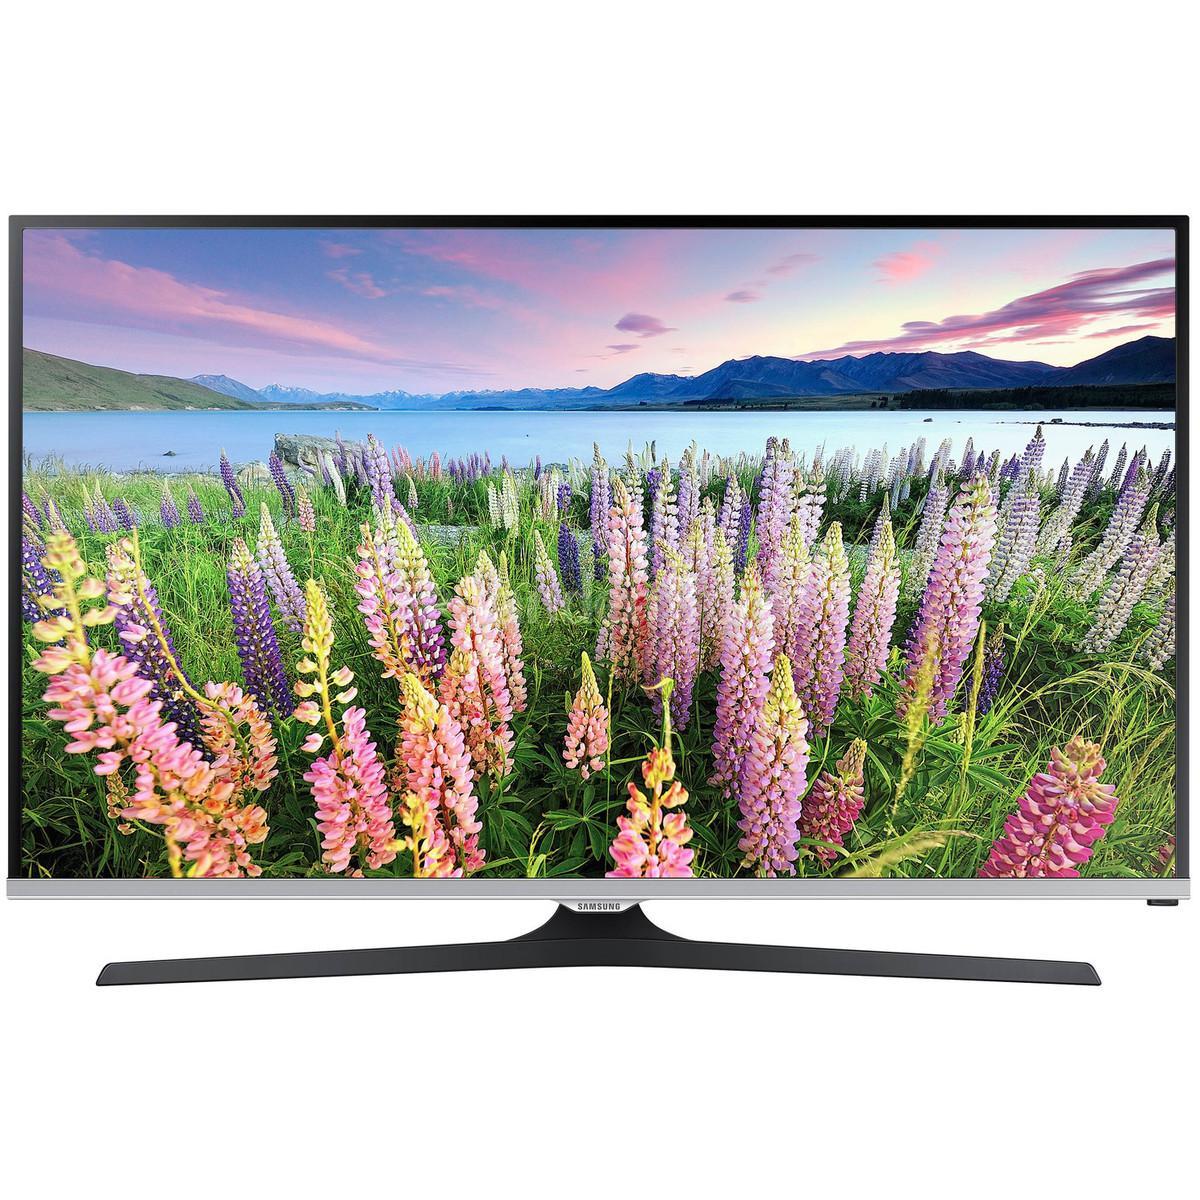 "TV 48"" Samsung UE48J5100 (via ODR 10%) - LED, Full HD"